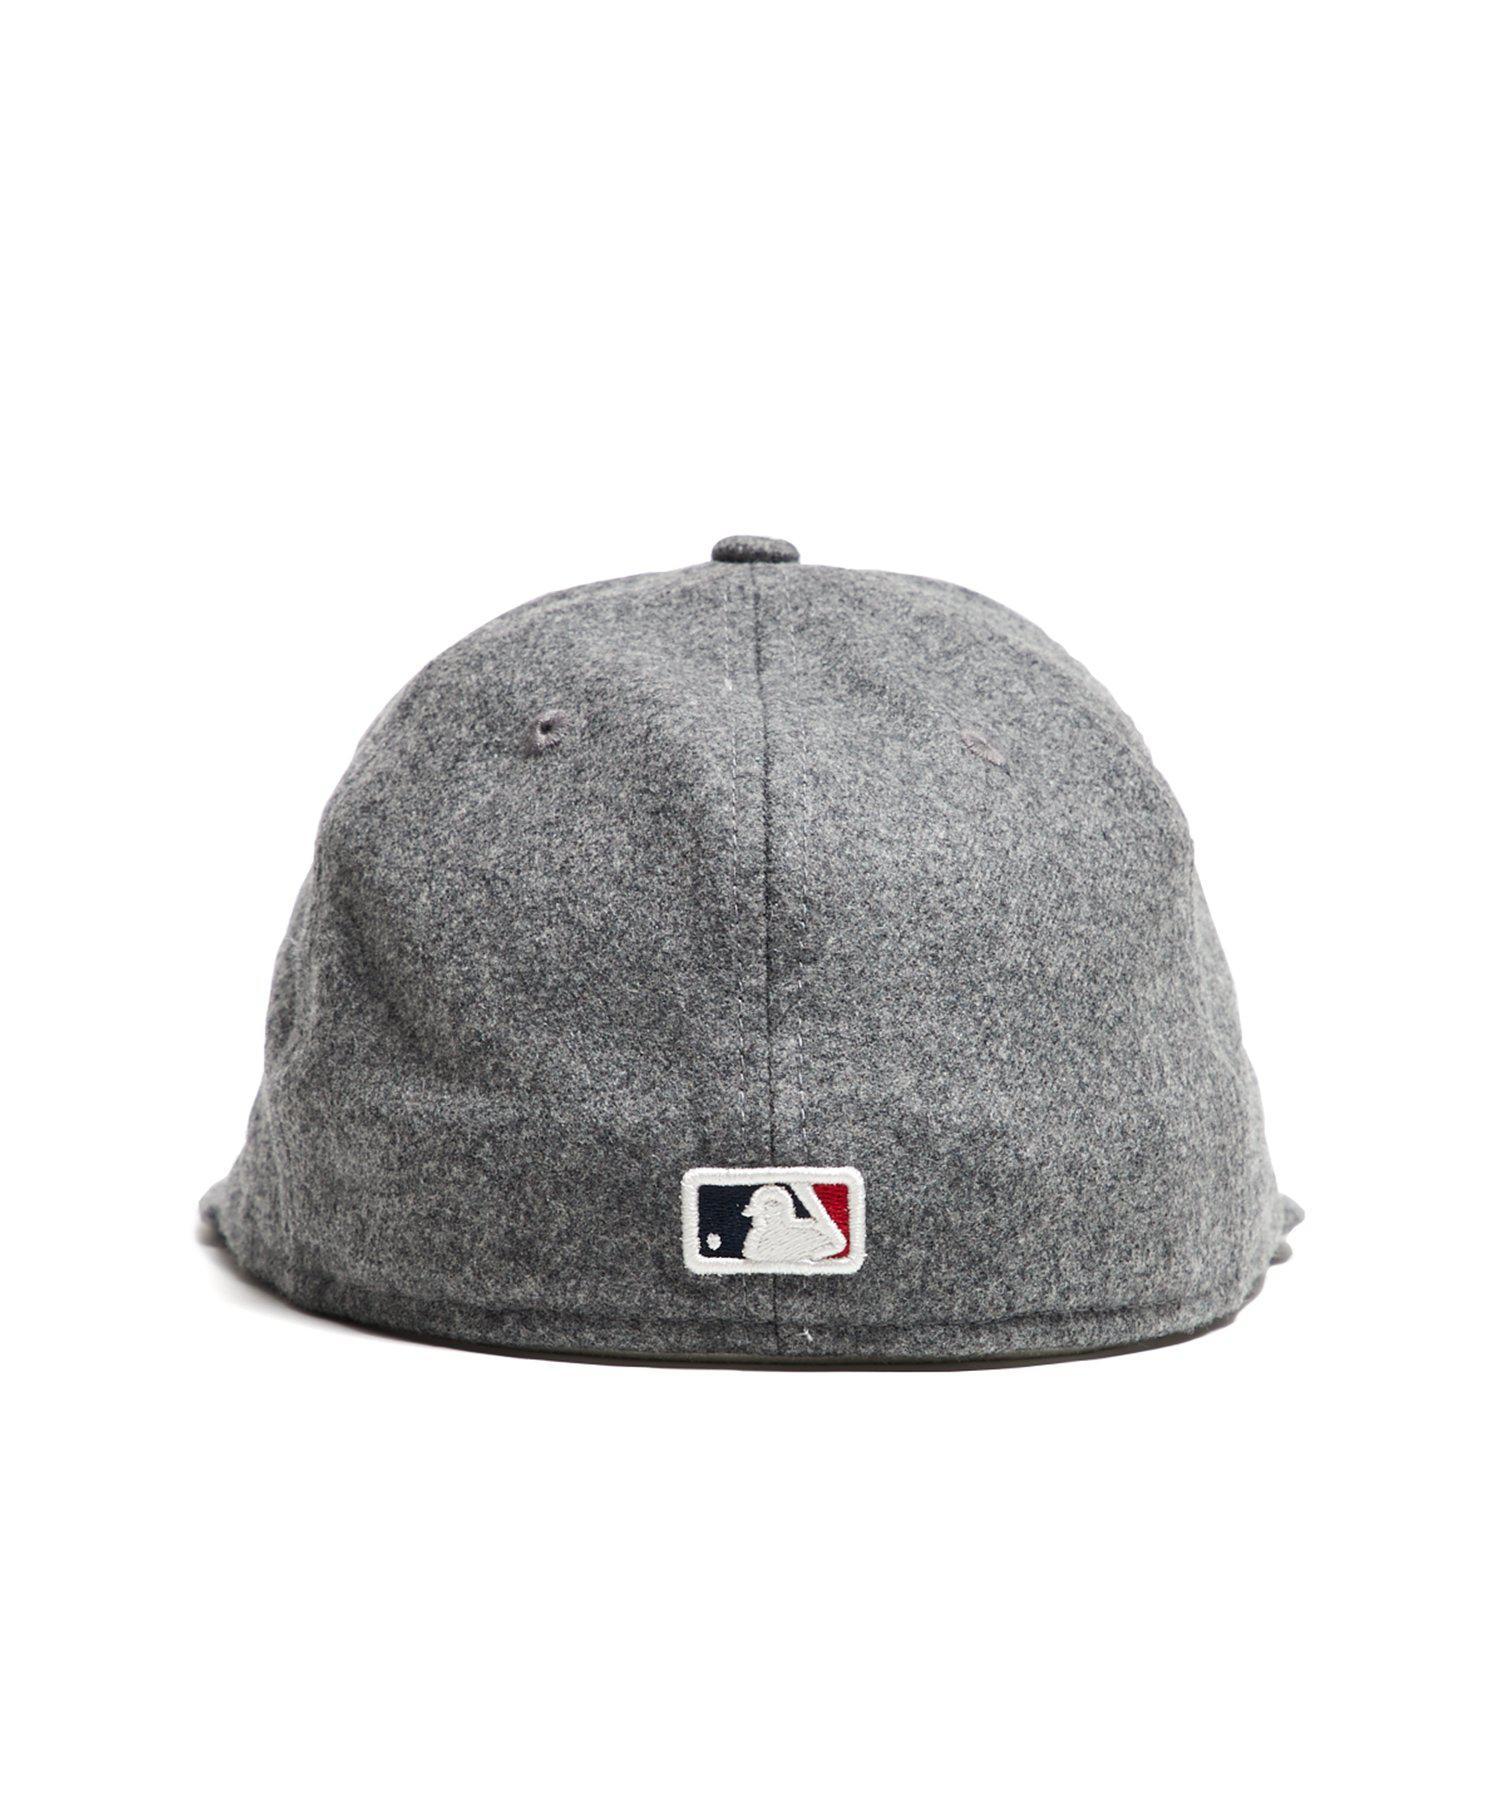 3ec23eee2d6 NEW ERA HATS - Gray Exclusive Boston Red Sox Hat In Italian Barberis Wool  Flannel for. View fullscreen